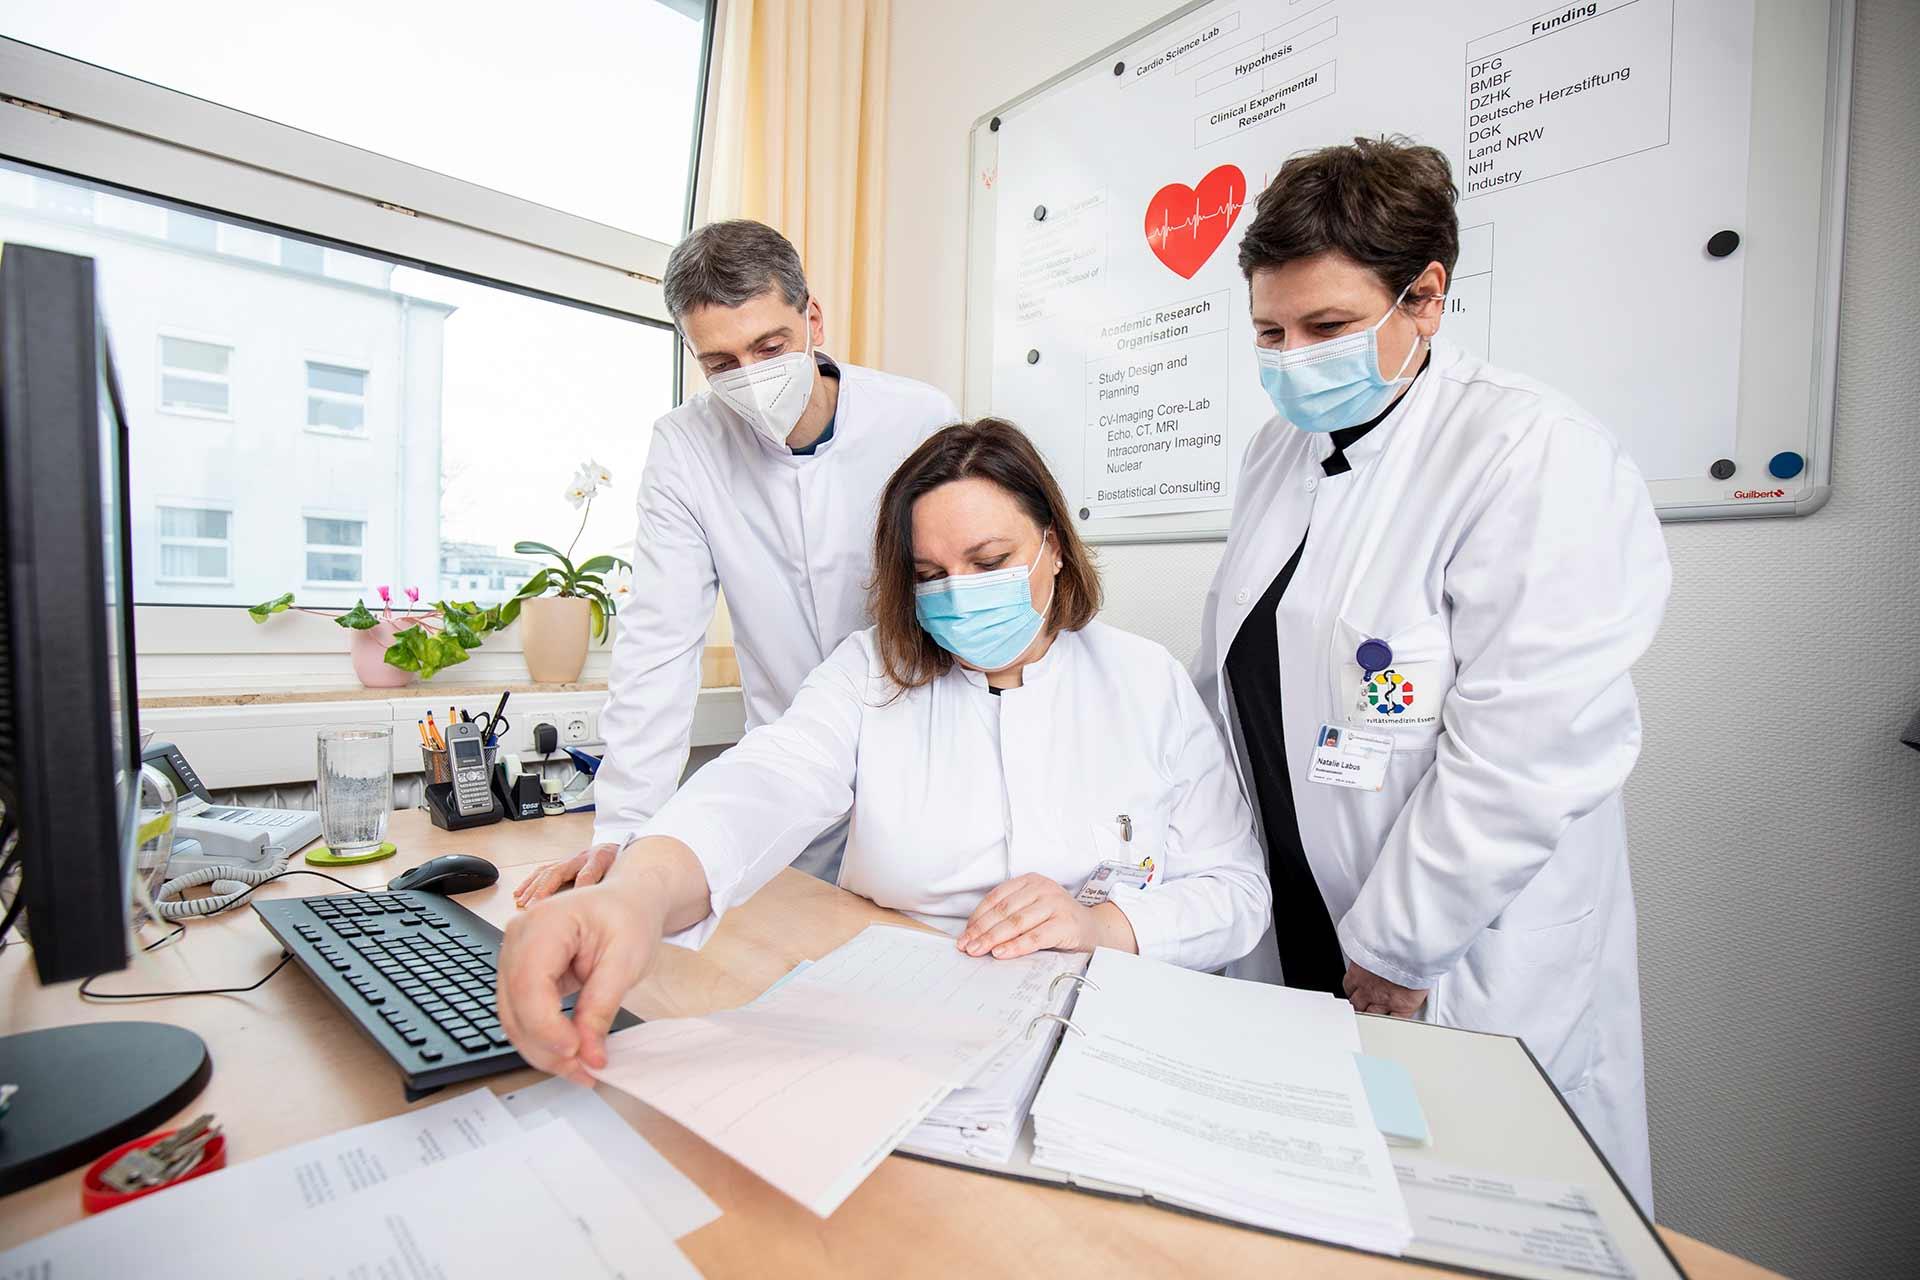 Cardiac Trial Unit - Titelbild